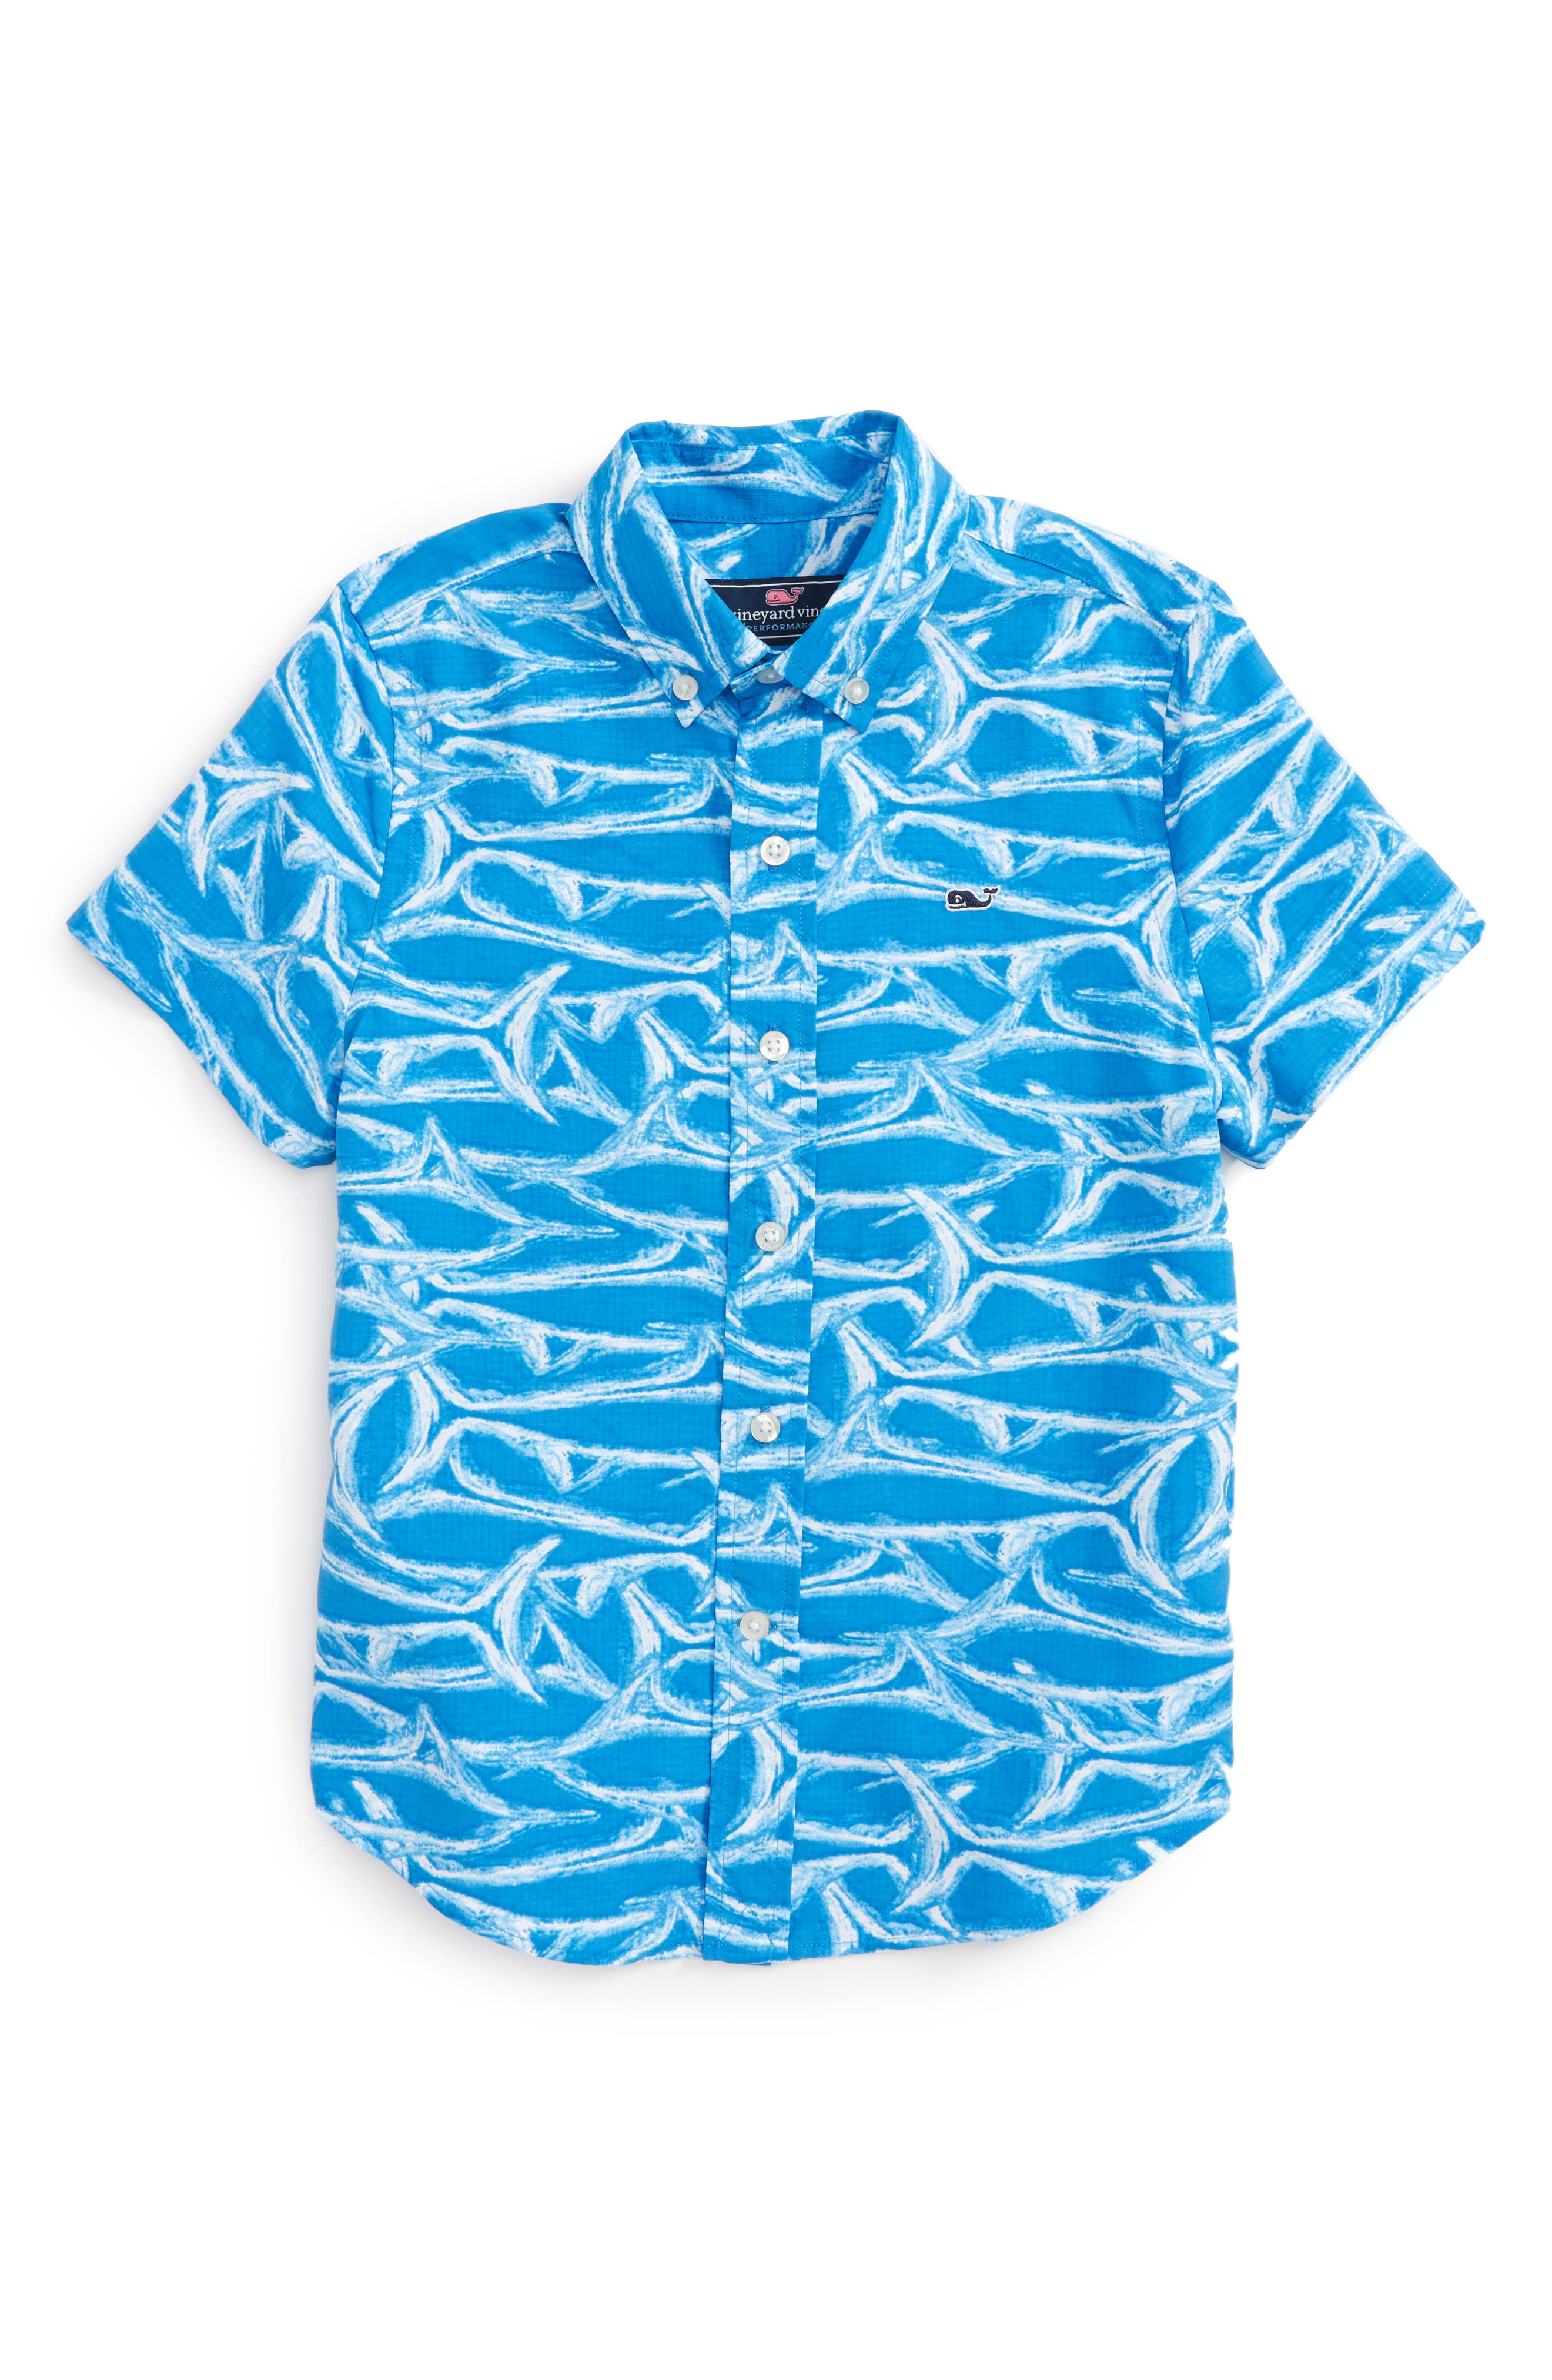 VINEYARD VINES Brushed Marlin Whale Shirt